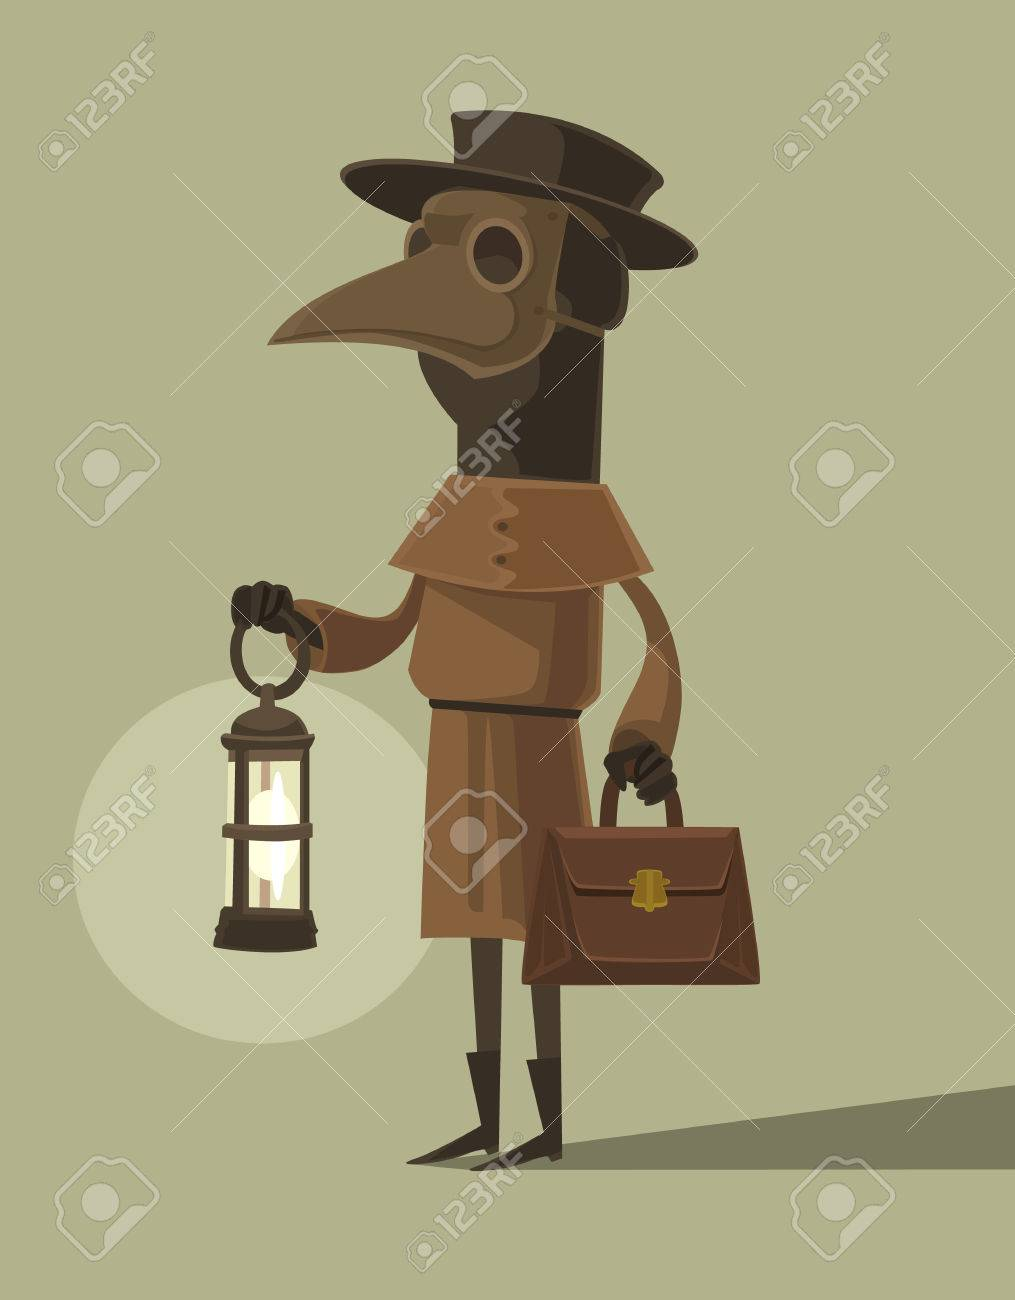 a6461da7392a9 Plague doctor character mascot in crow mask hold lamp. Vector flat cartoon  illustration Stock Vector